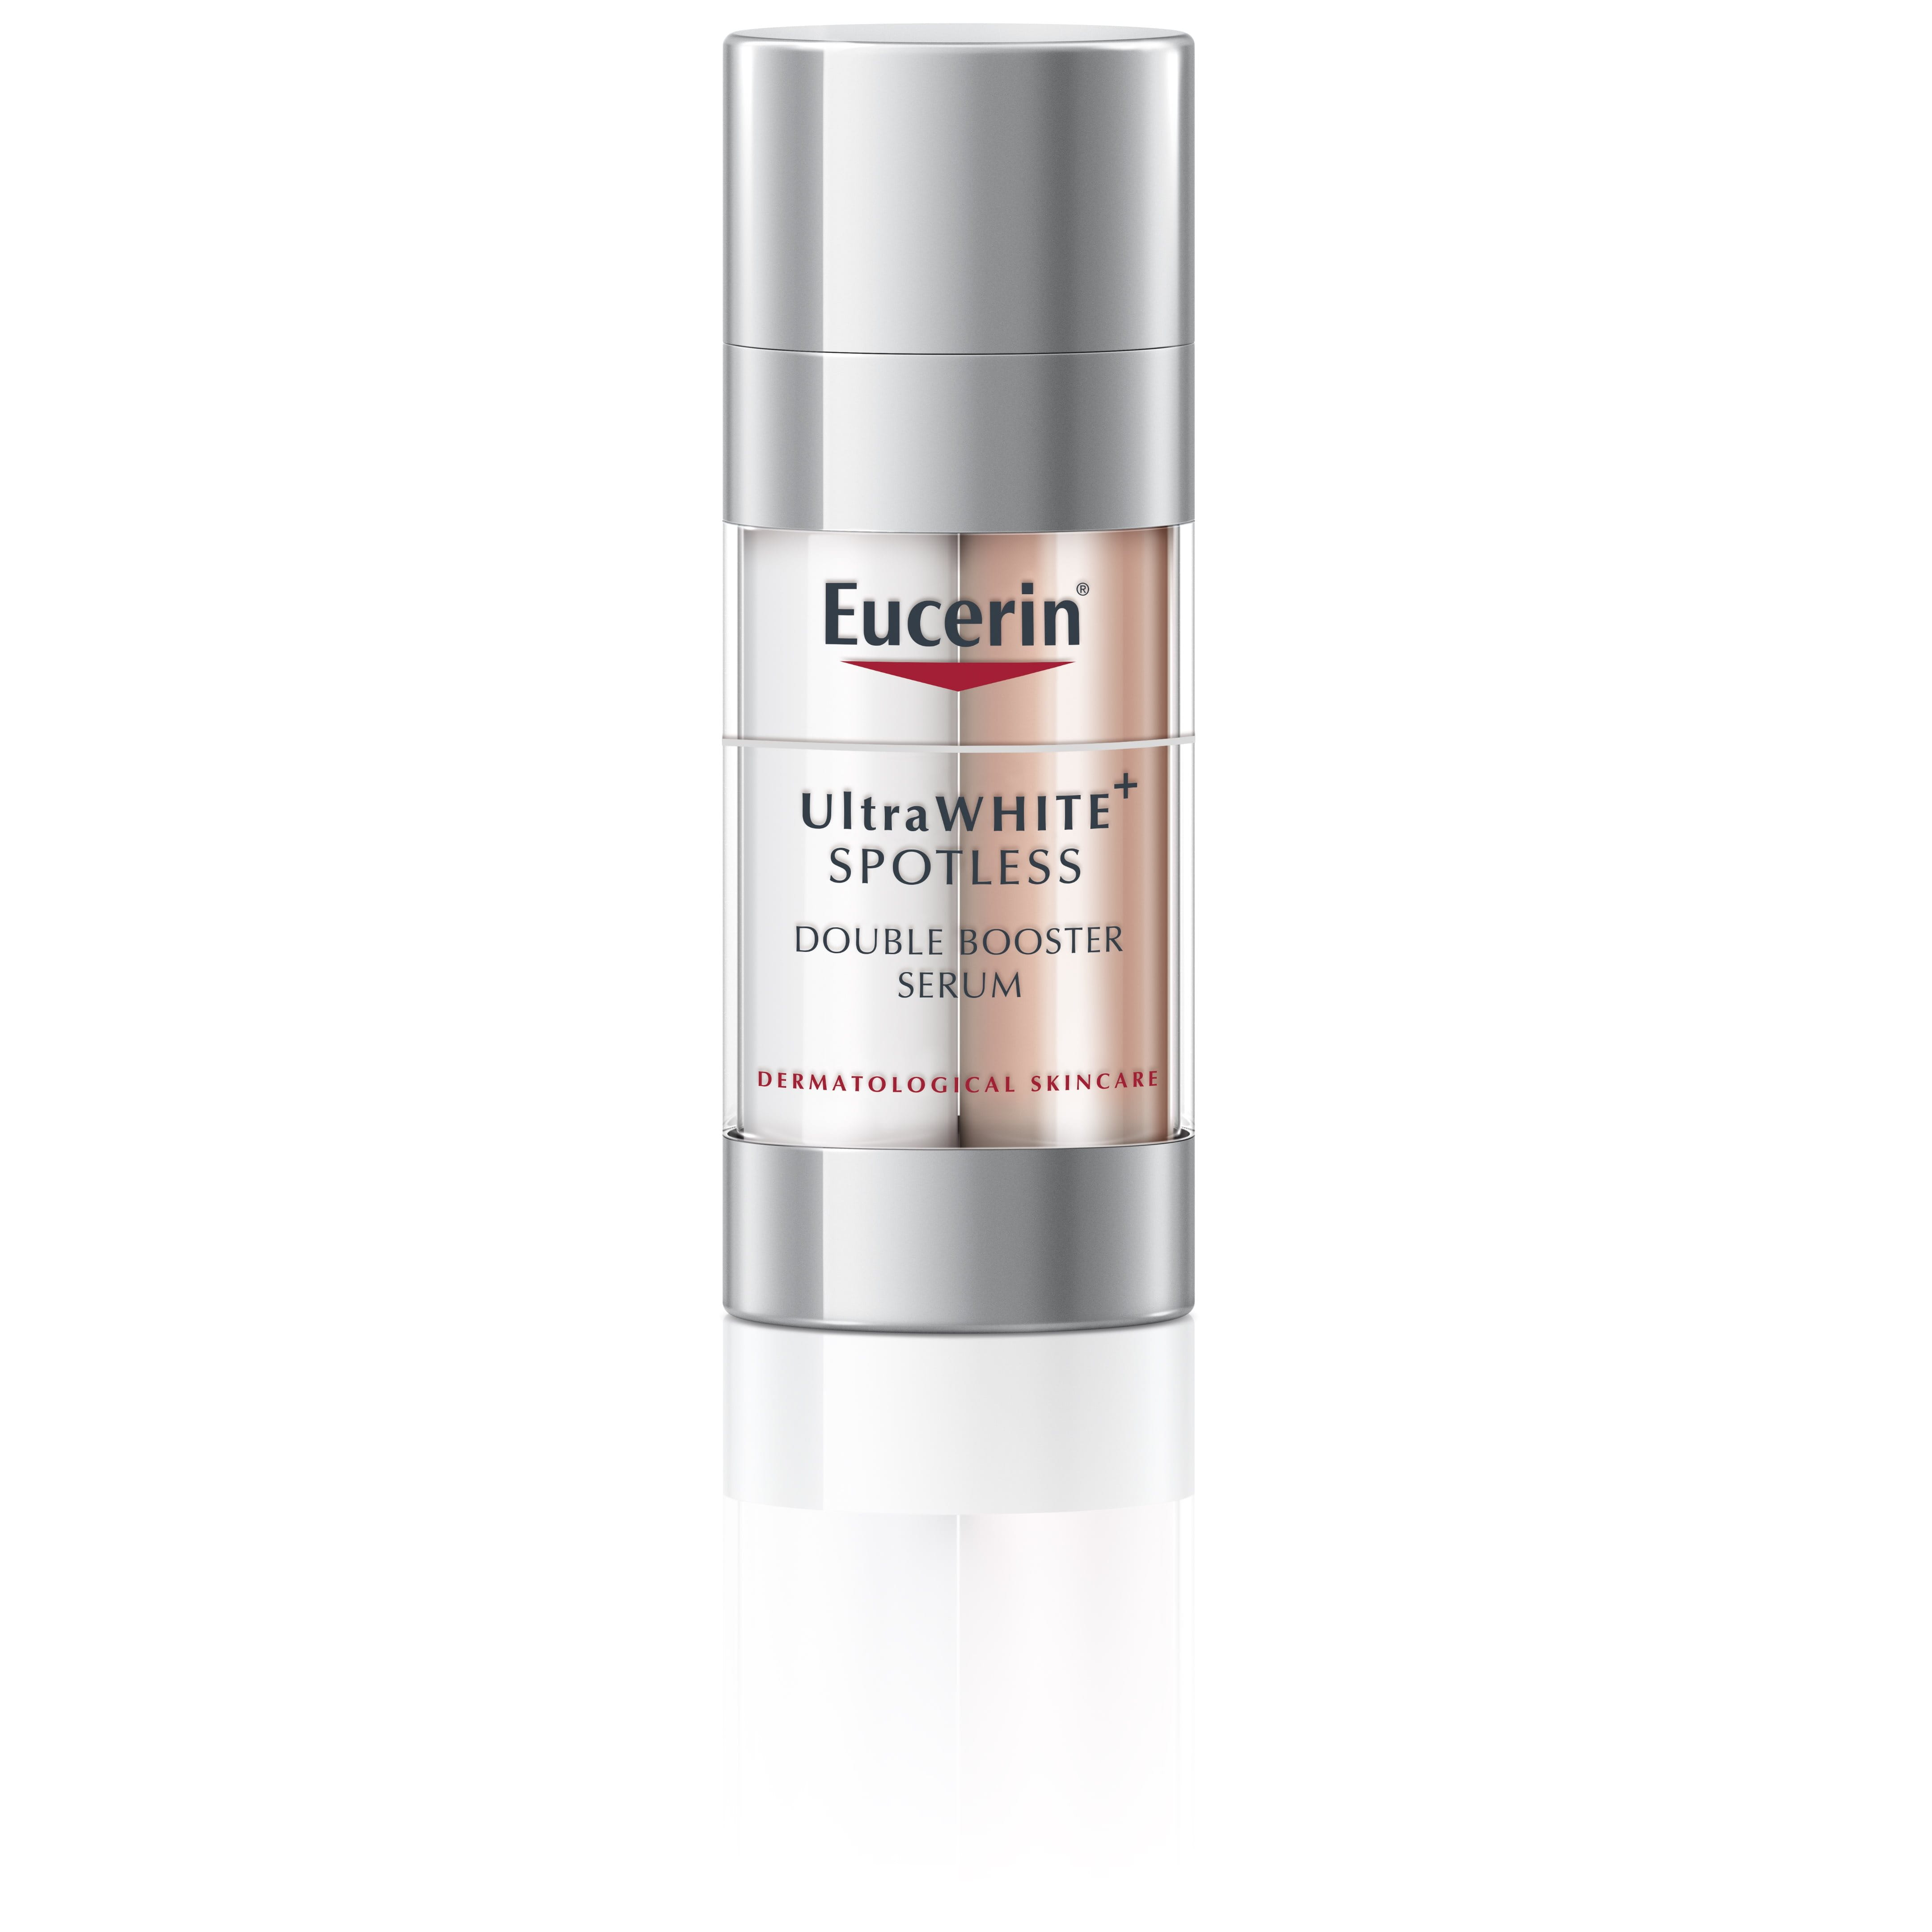 Eucerin Ultrawhite Spoltess Double Booster